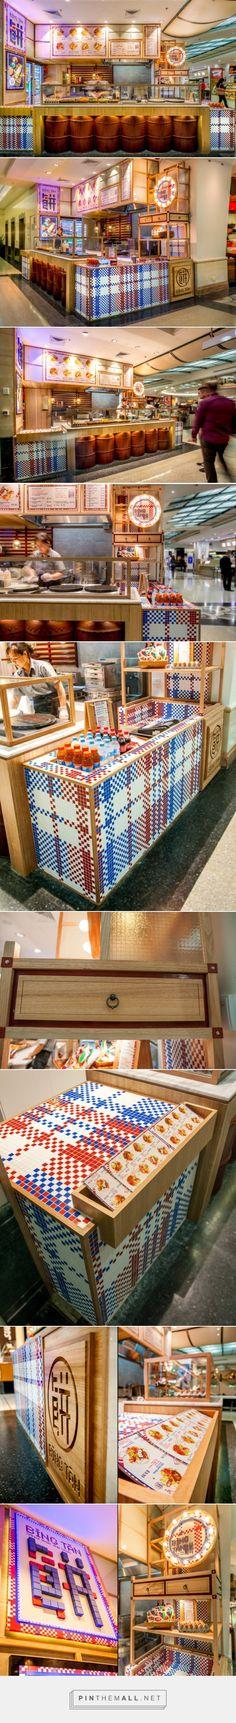 Bing Tan by Creative 9, Sydney – Australia »  Retail Design Blog - created via https://pinthemall.net